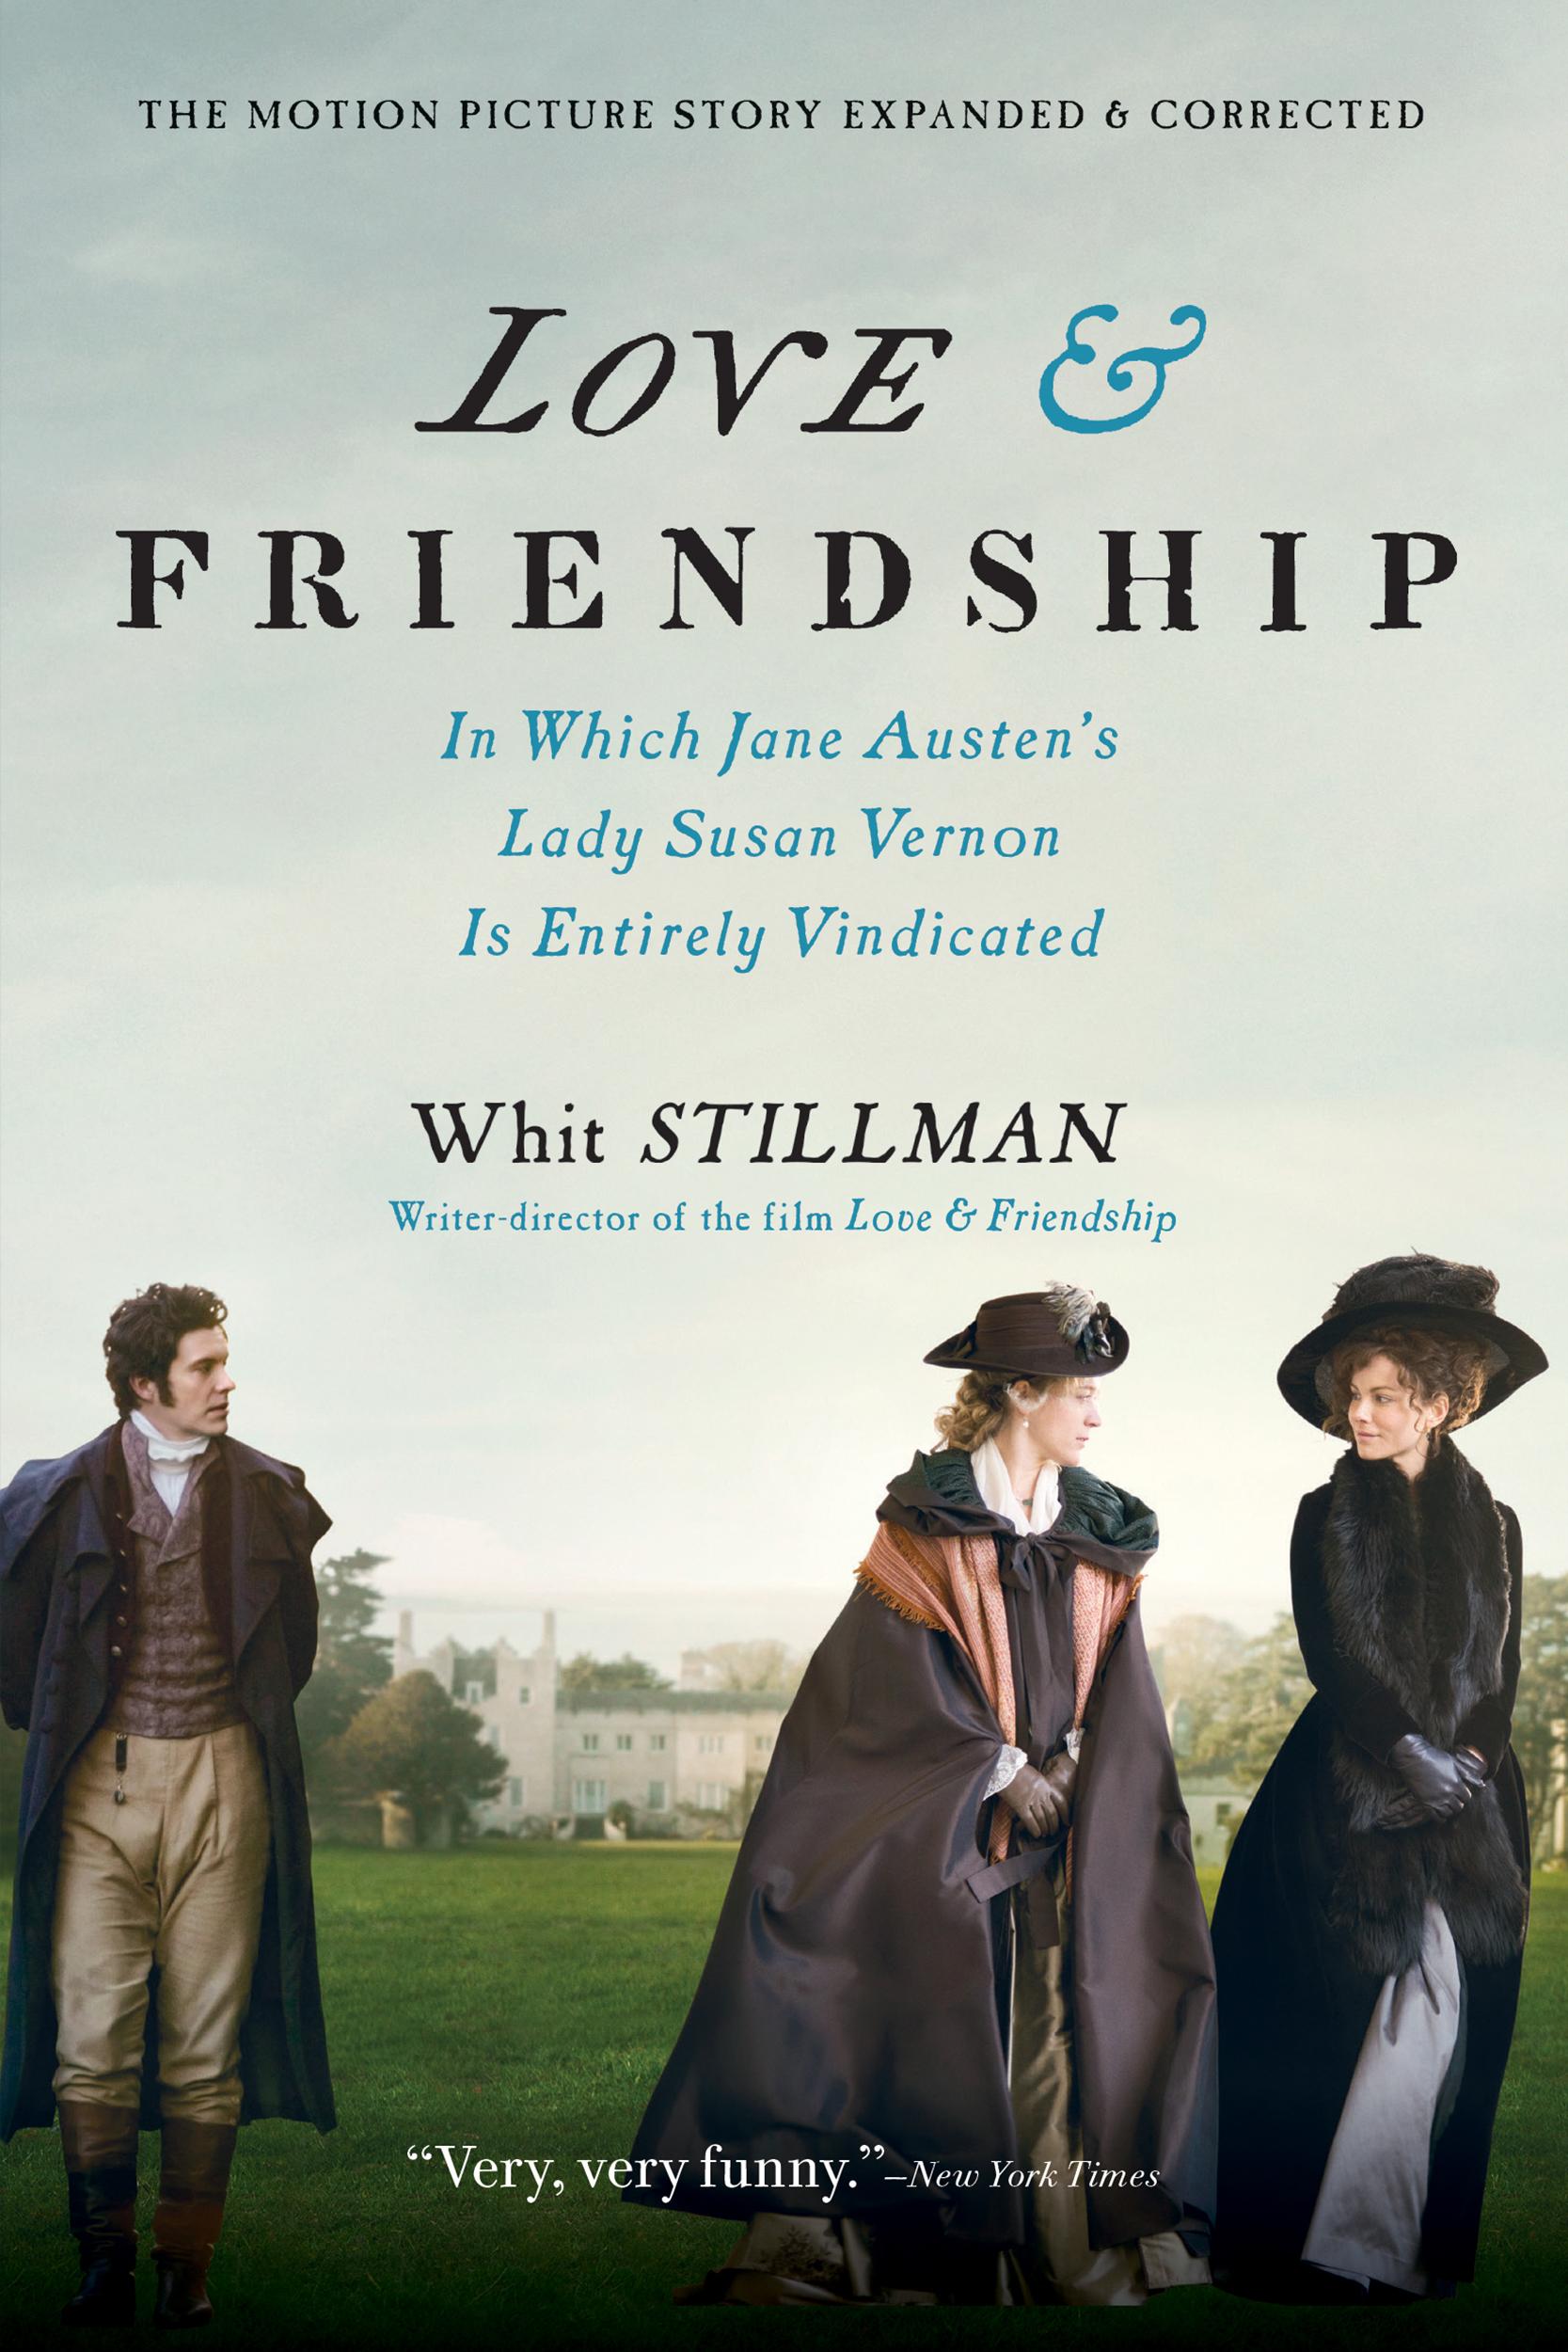 Love & Friendship In Which Jane Austen's Lady Susan Vernon Is Entirely Vindicated